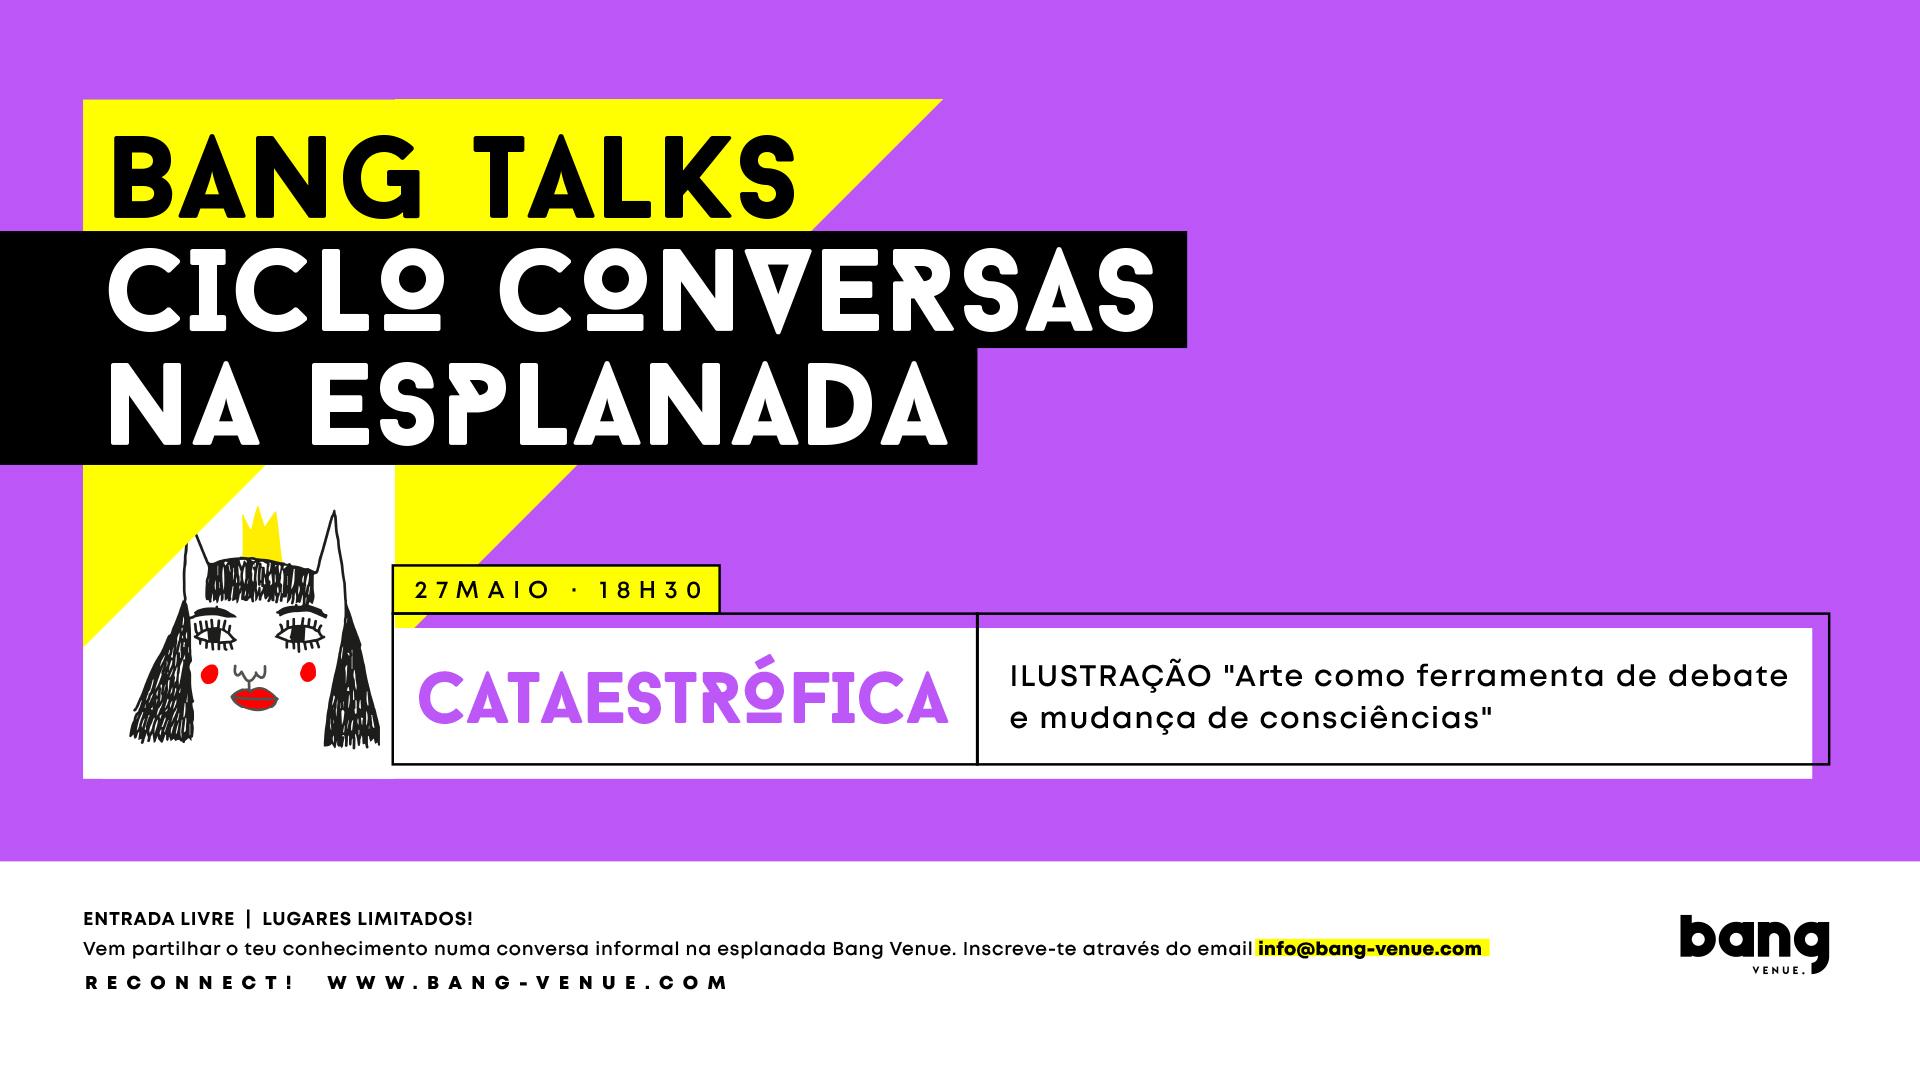 Bang Talk's | Ciclo de Conversas | Entrada Livre